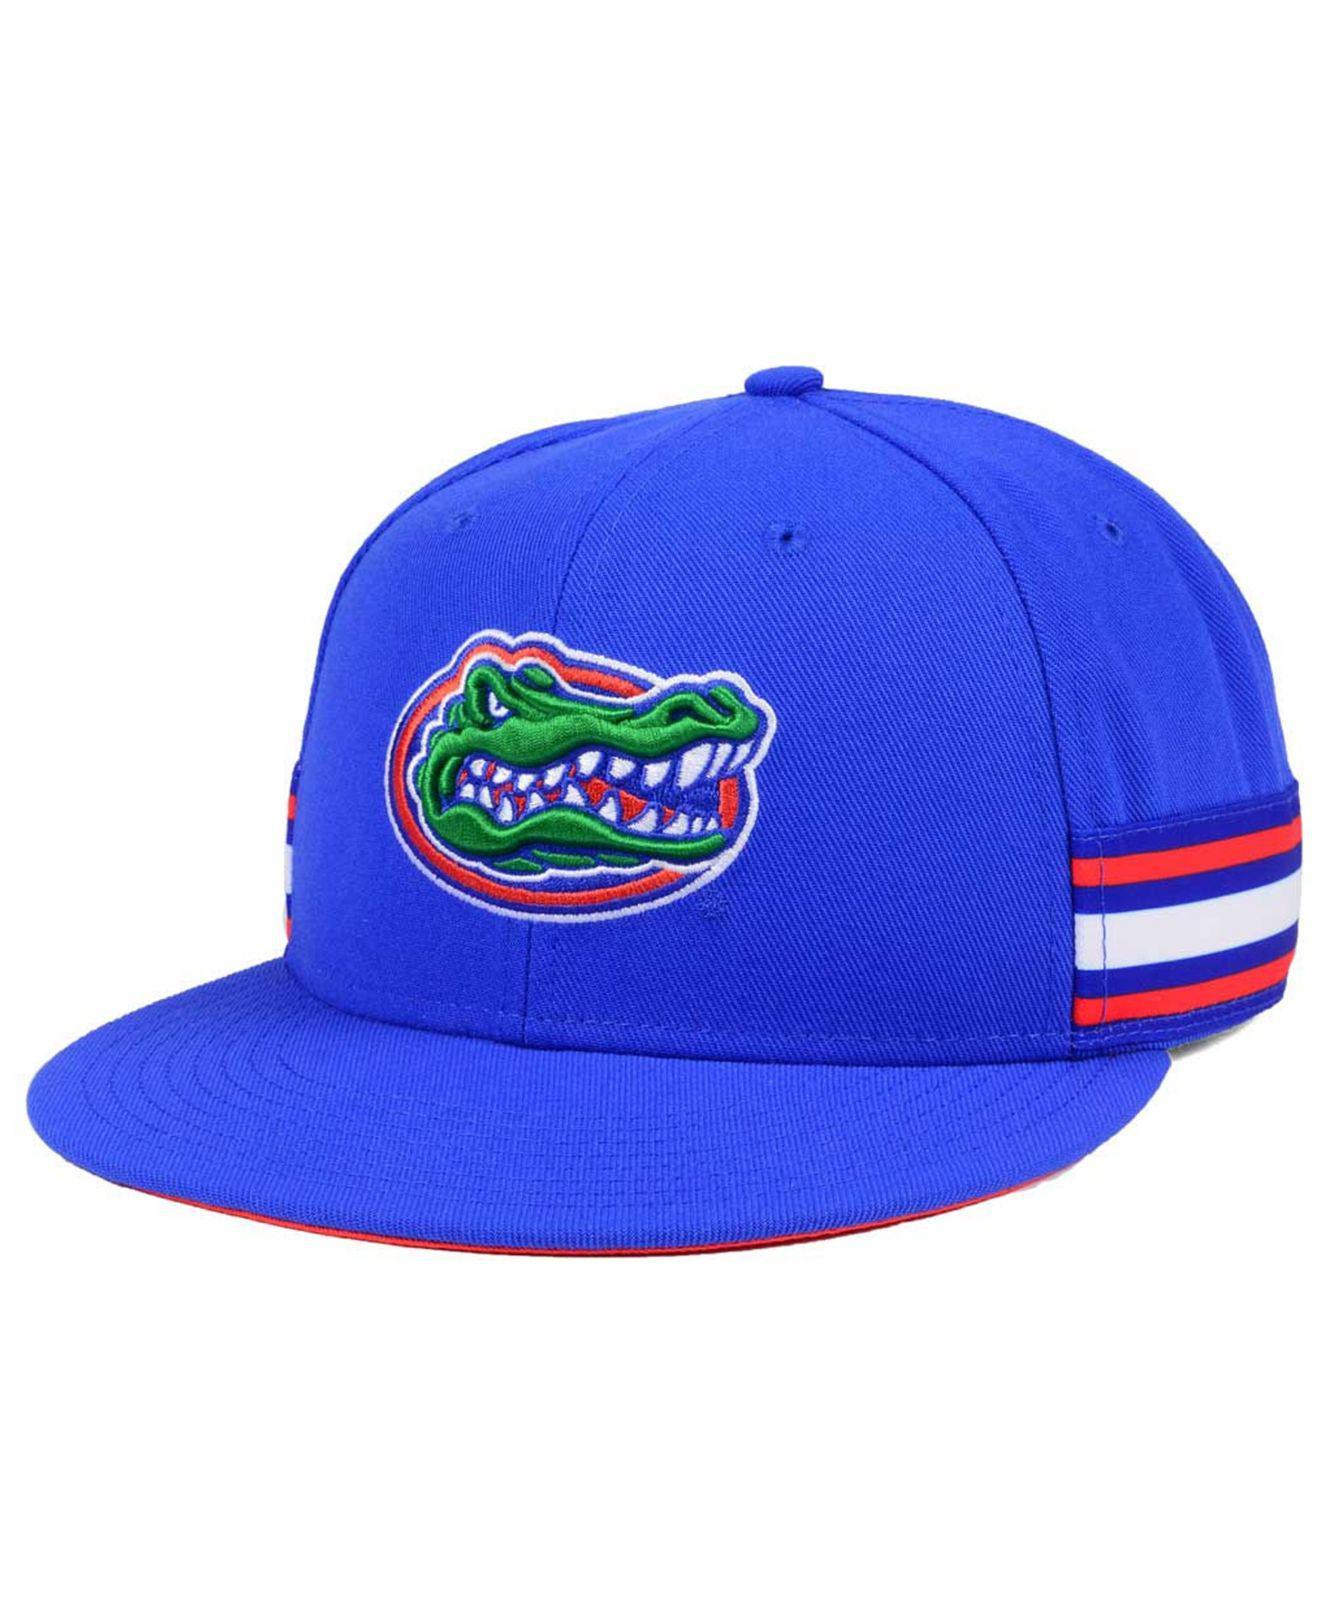 innovative design 9e4d6 b3bde Nike Florida Gators True Woven Stripe Snapback Cap in Blue for Men ...